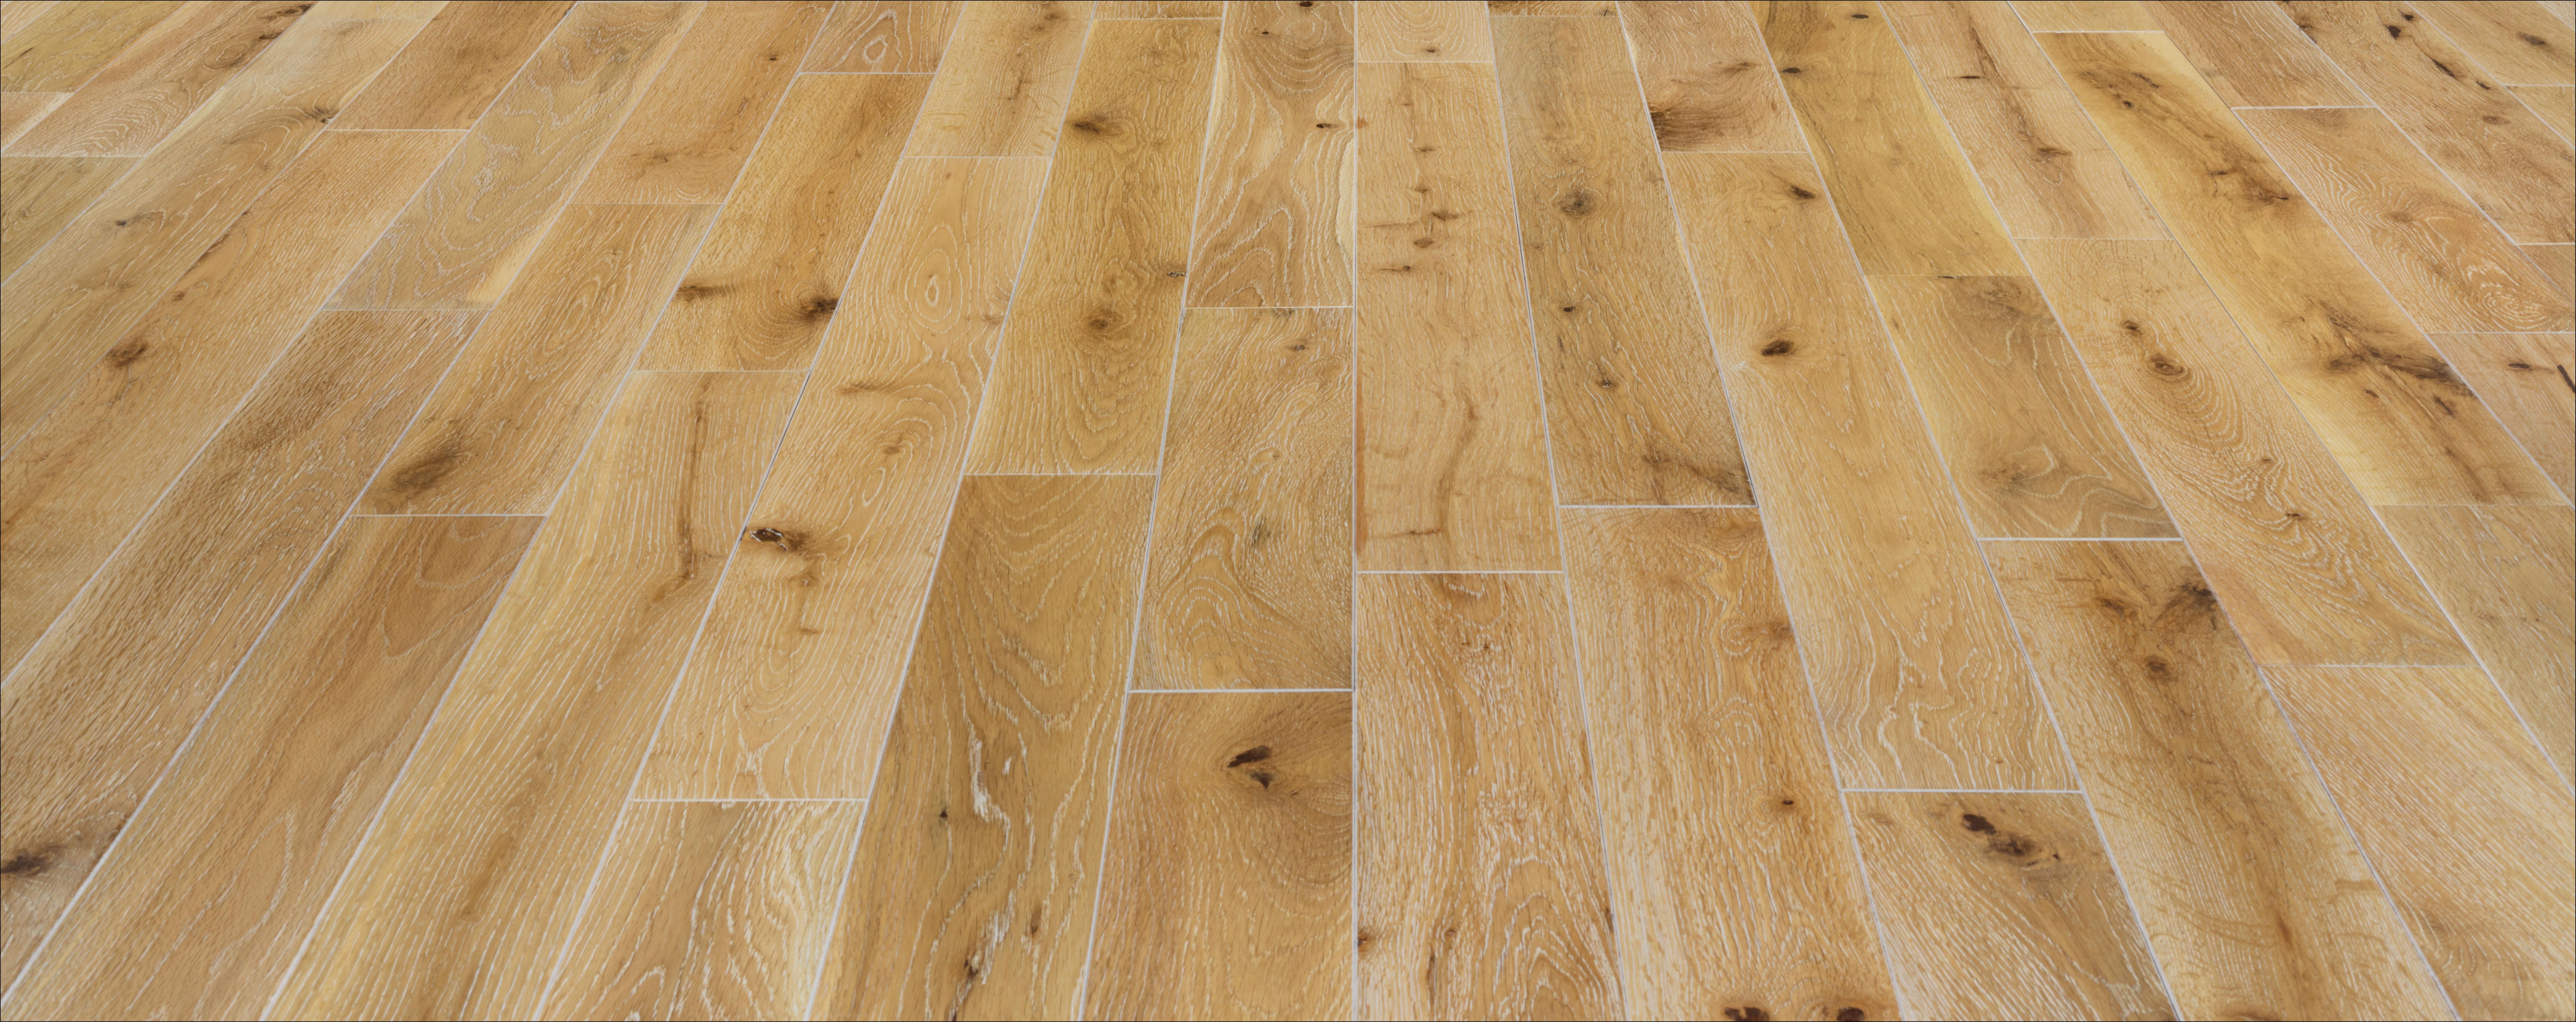 1 2 hardwood flooring of wide plank flooring ideas intended for wide plank white oak wood flooring images harbor oak 3 1 2″ white oak white